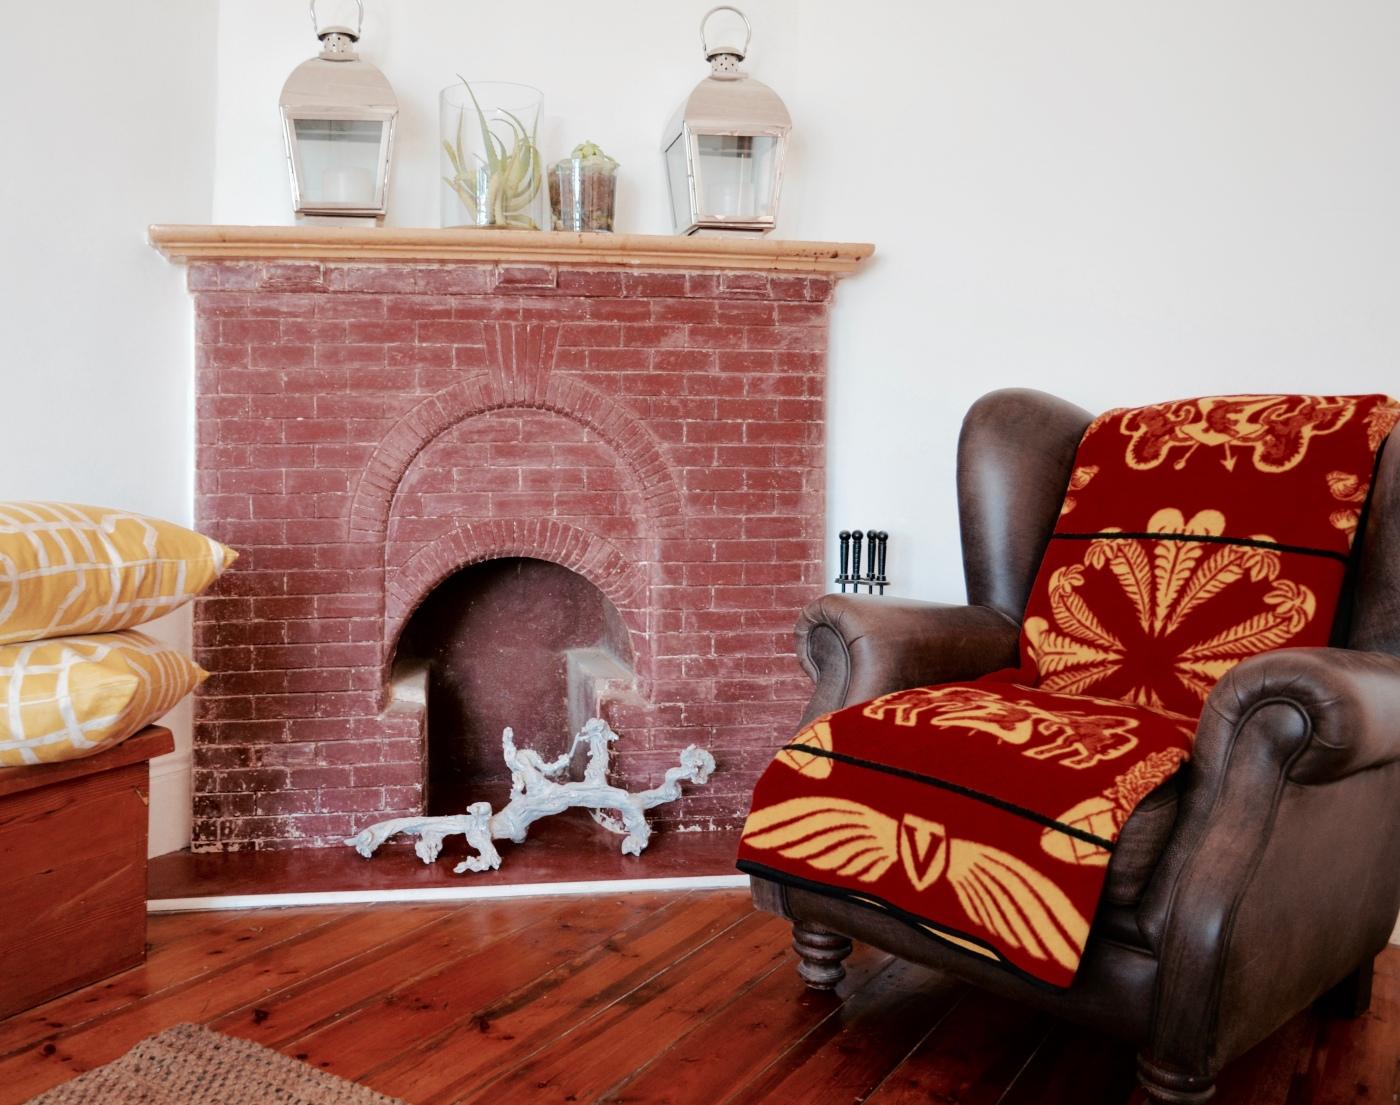 Aranda Spitfire Blanket